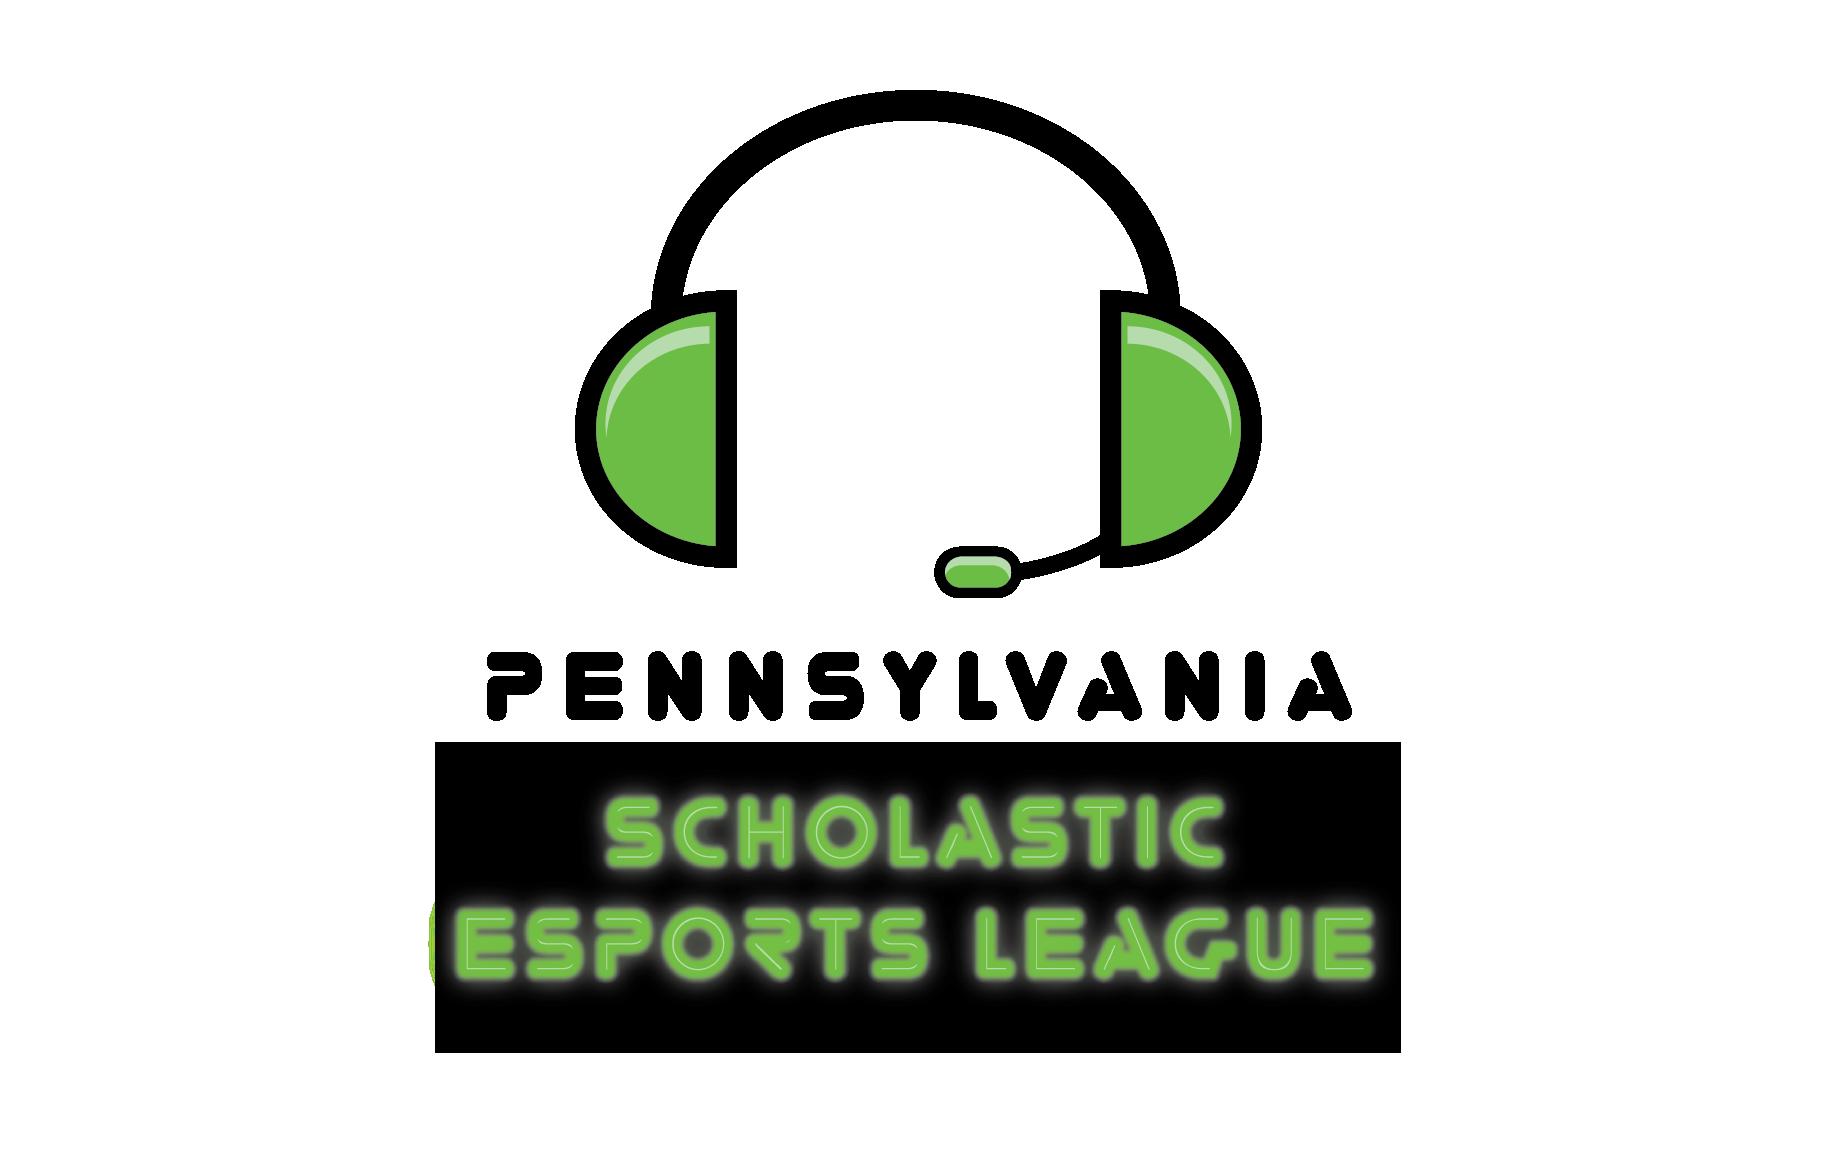 Pennsylvania Scholastic Esports League